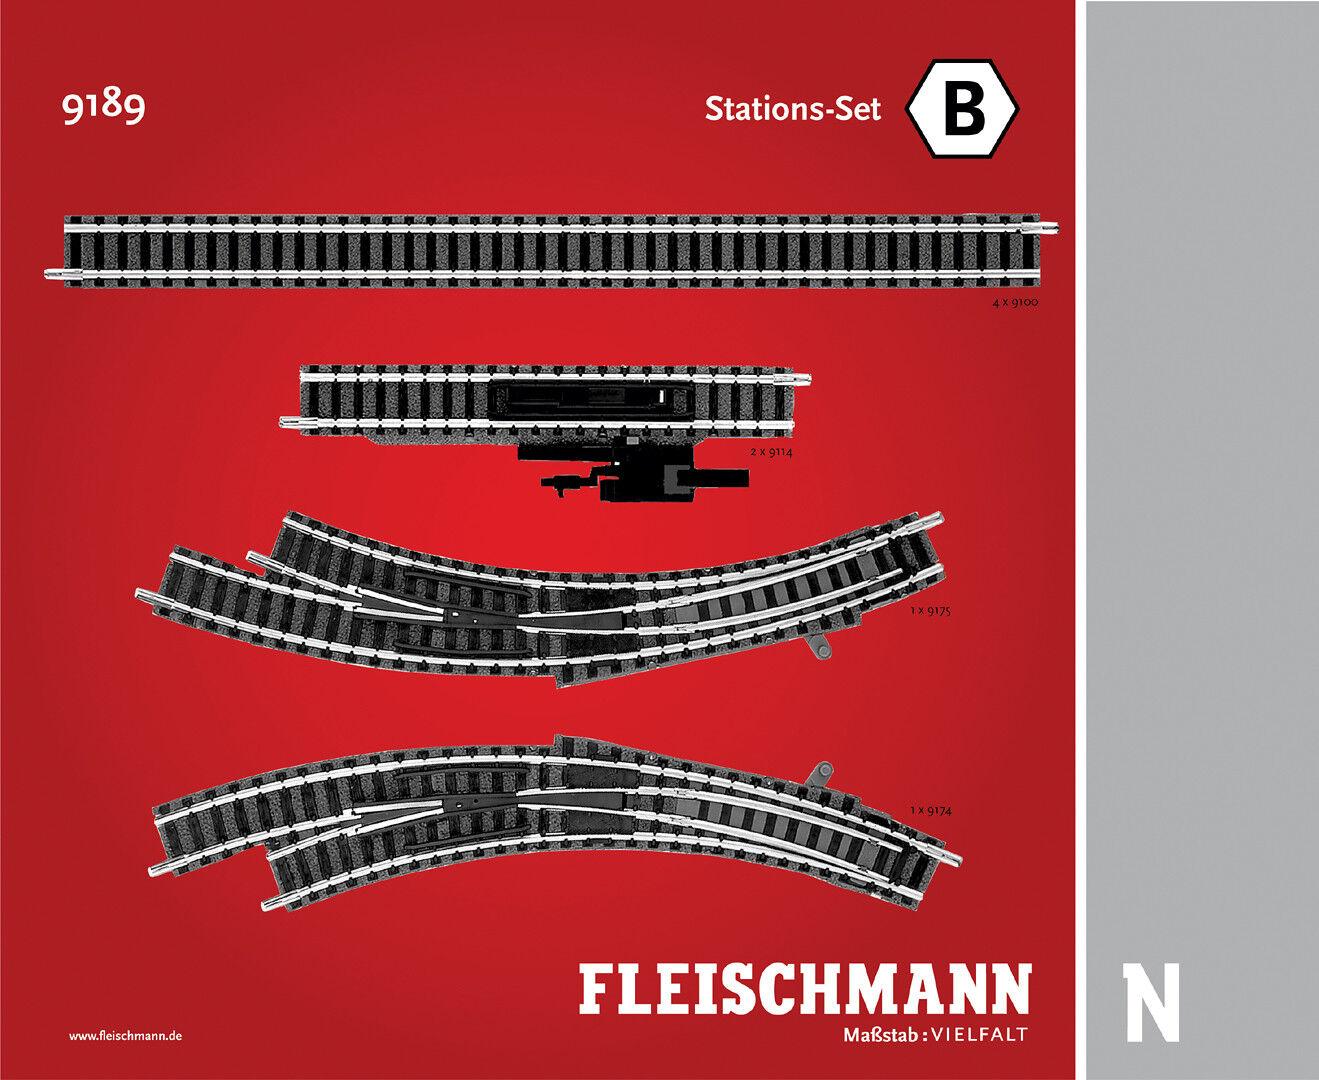 Fleischmann N 9189 Stations-Set B - Nuevo + Emb.orig